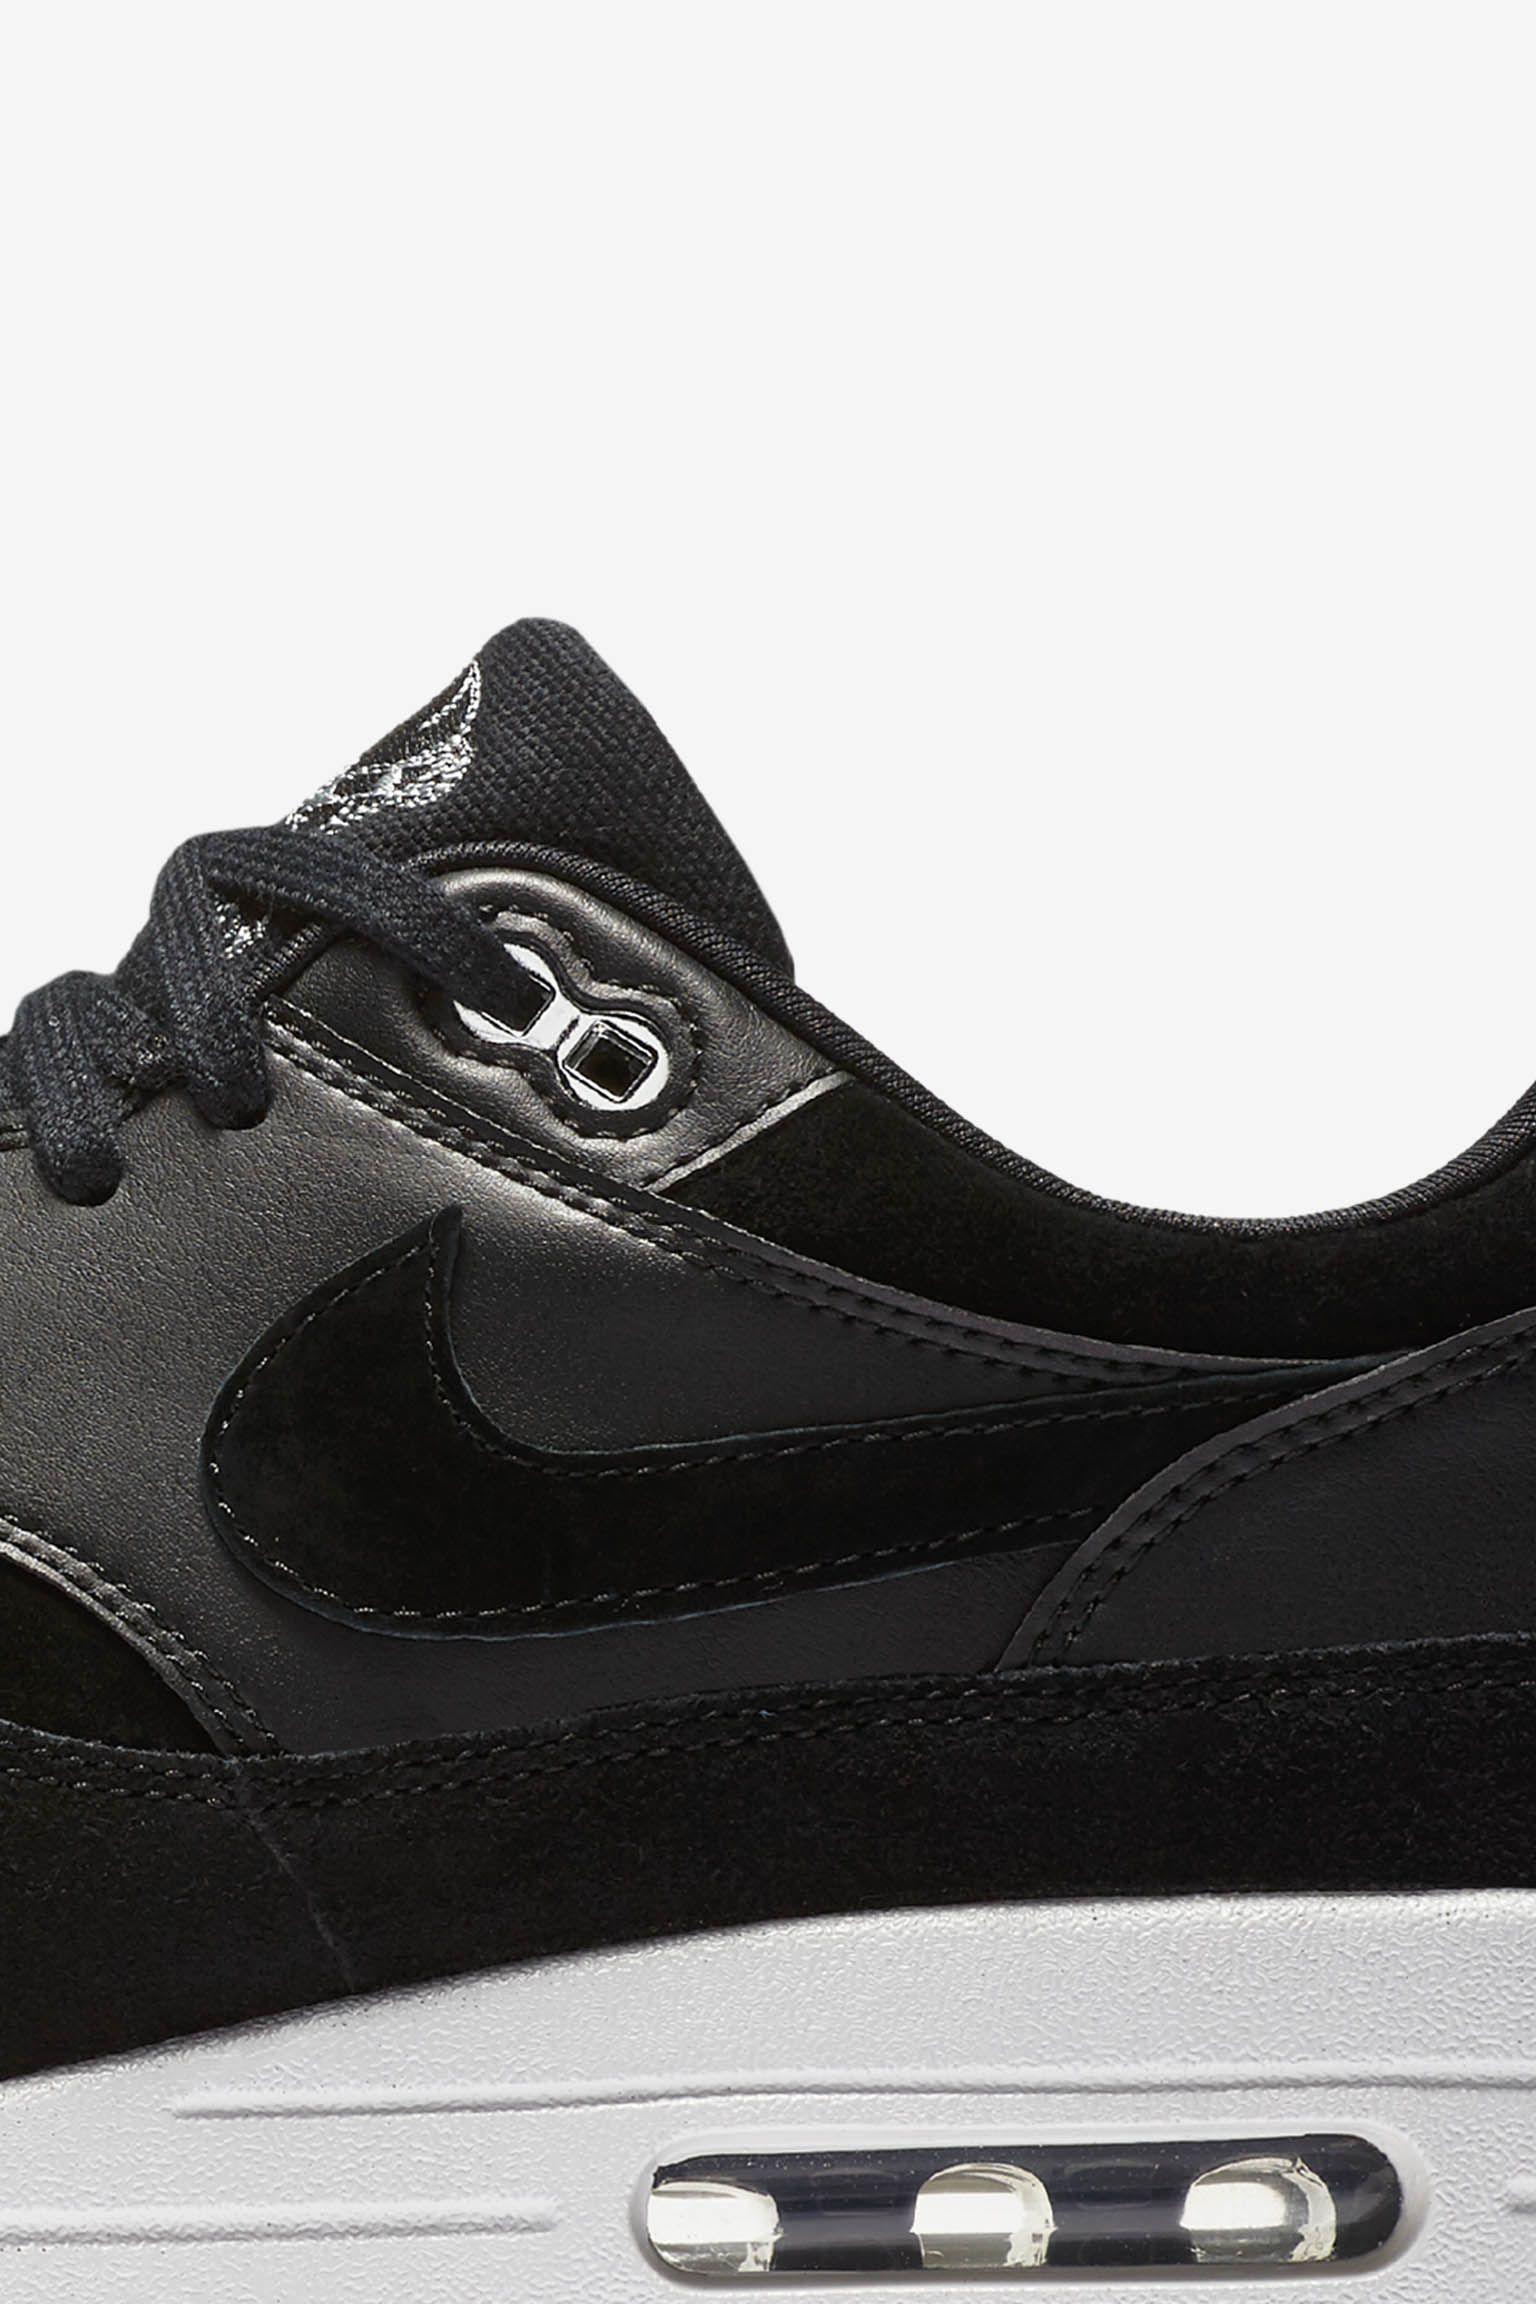 Date de sortie de la Nike Air Max 1 Premium « Black & Off ...